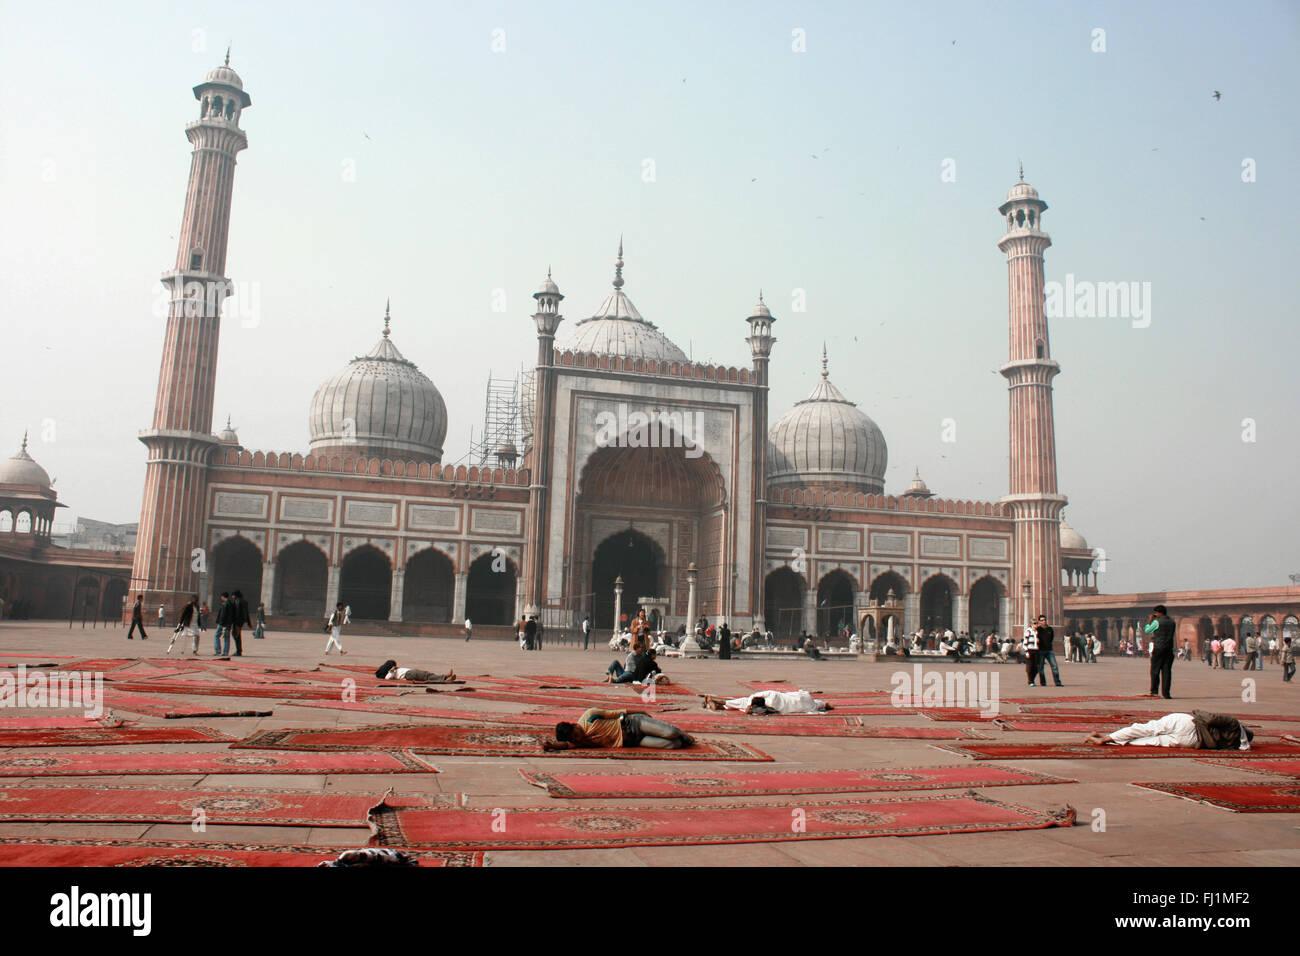 Jama Masjid (great mosque) of Old Delhi , India - Stock Image